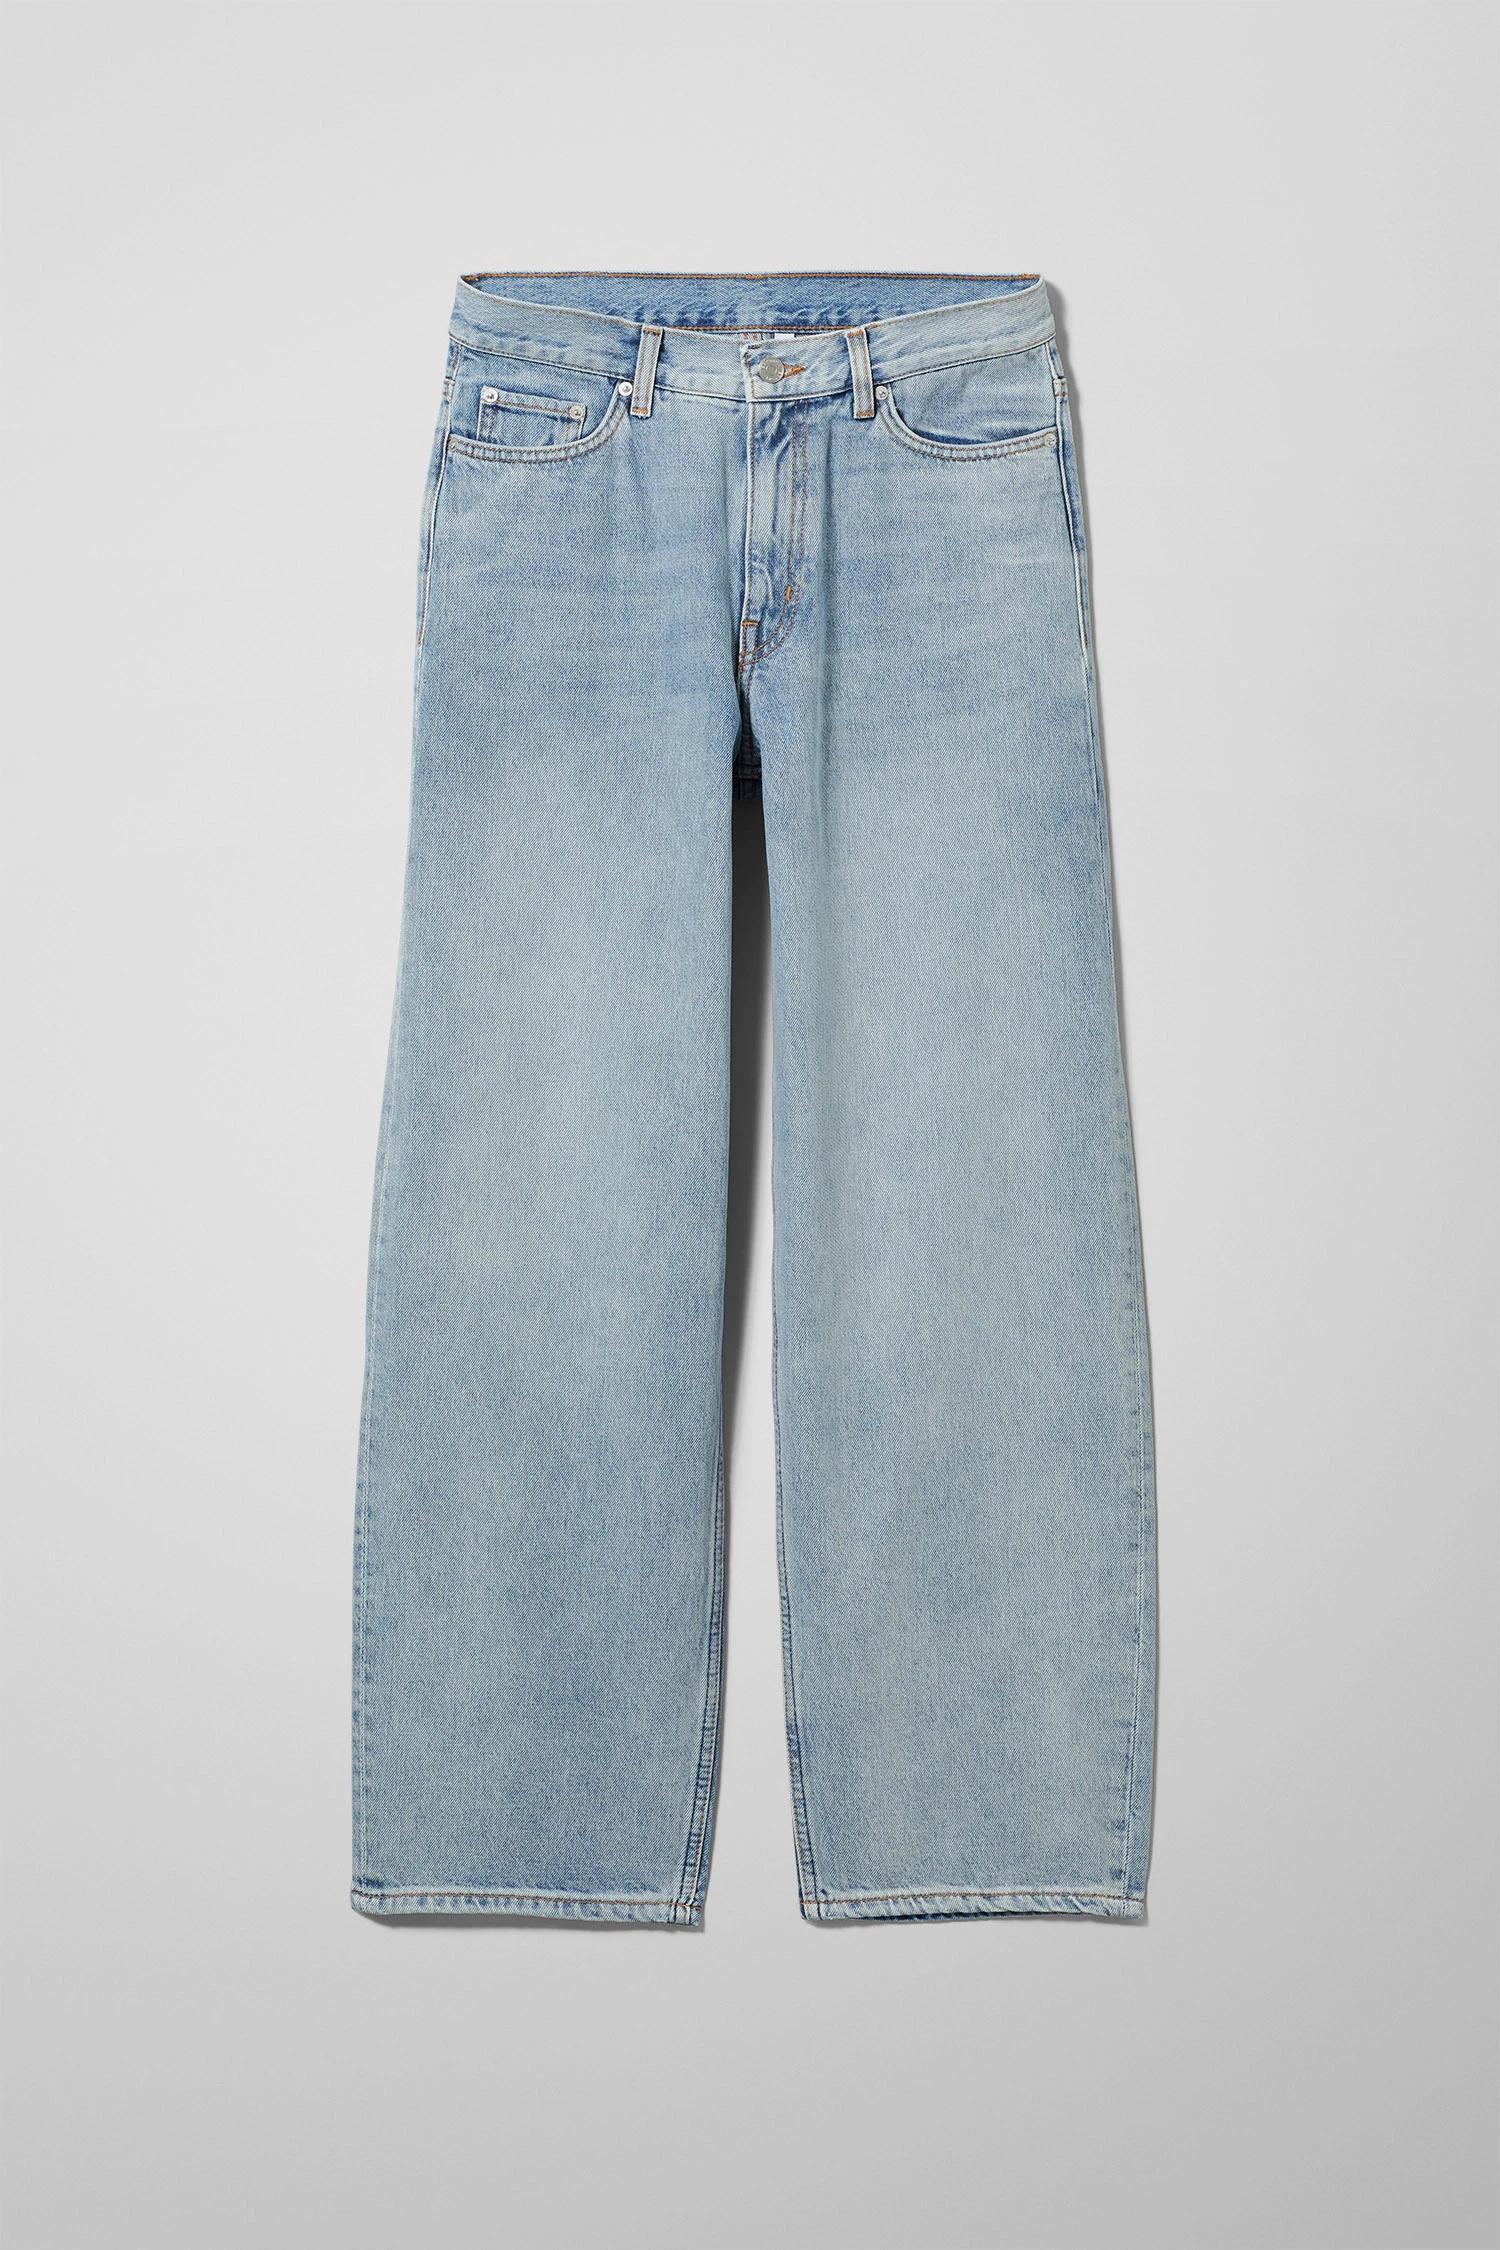 Weekday Denim Rail Miami Blue Jeans